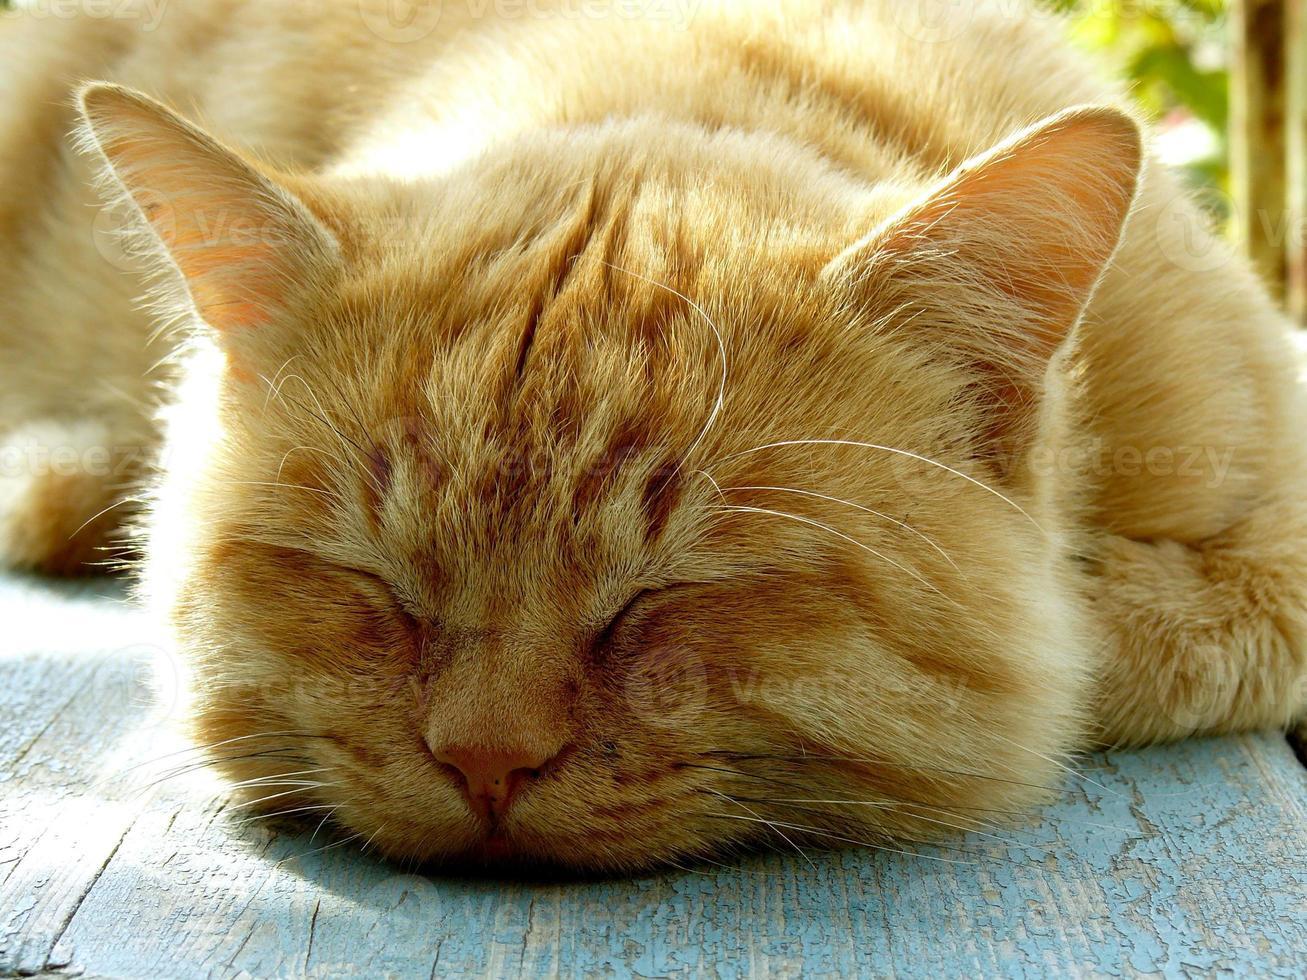 gato dormindo foto